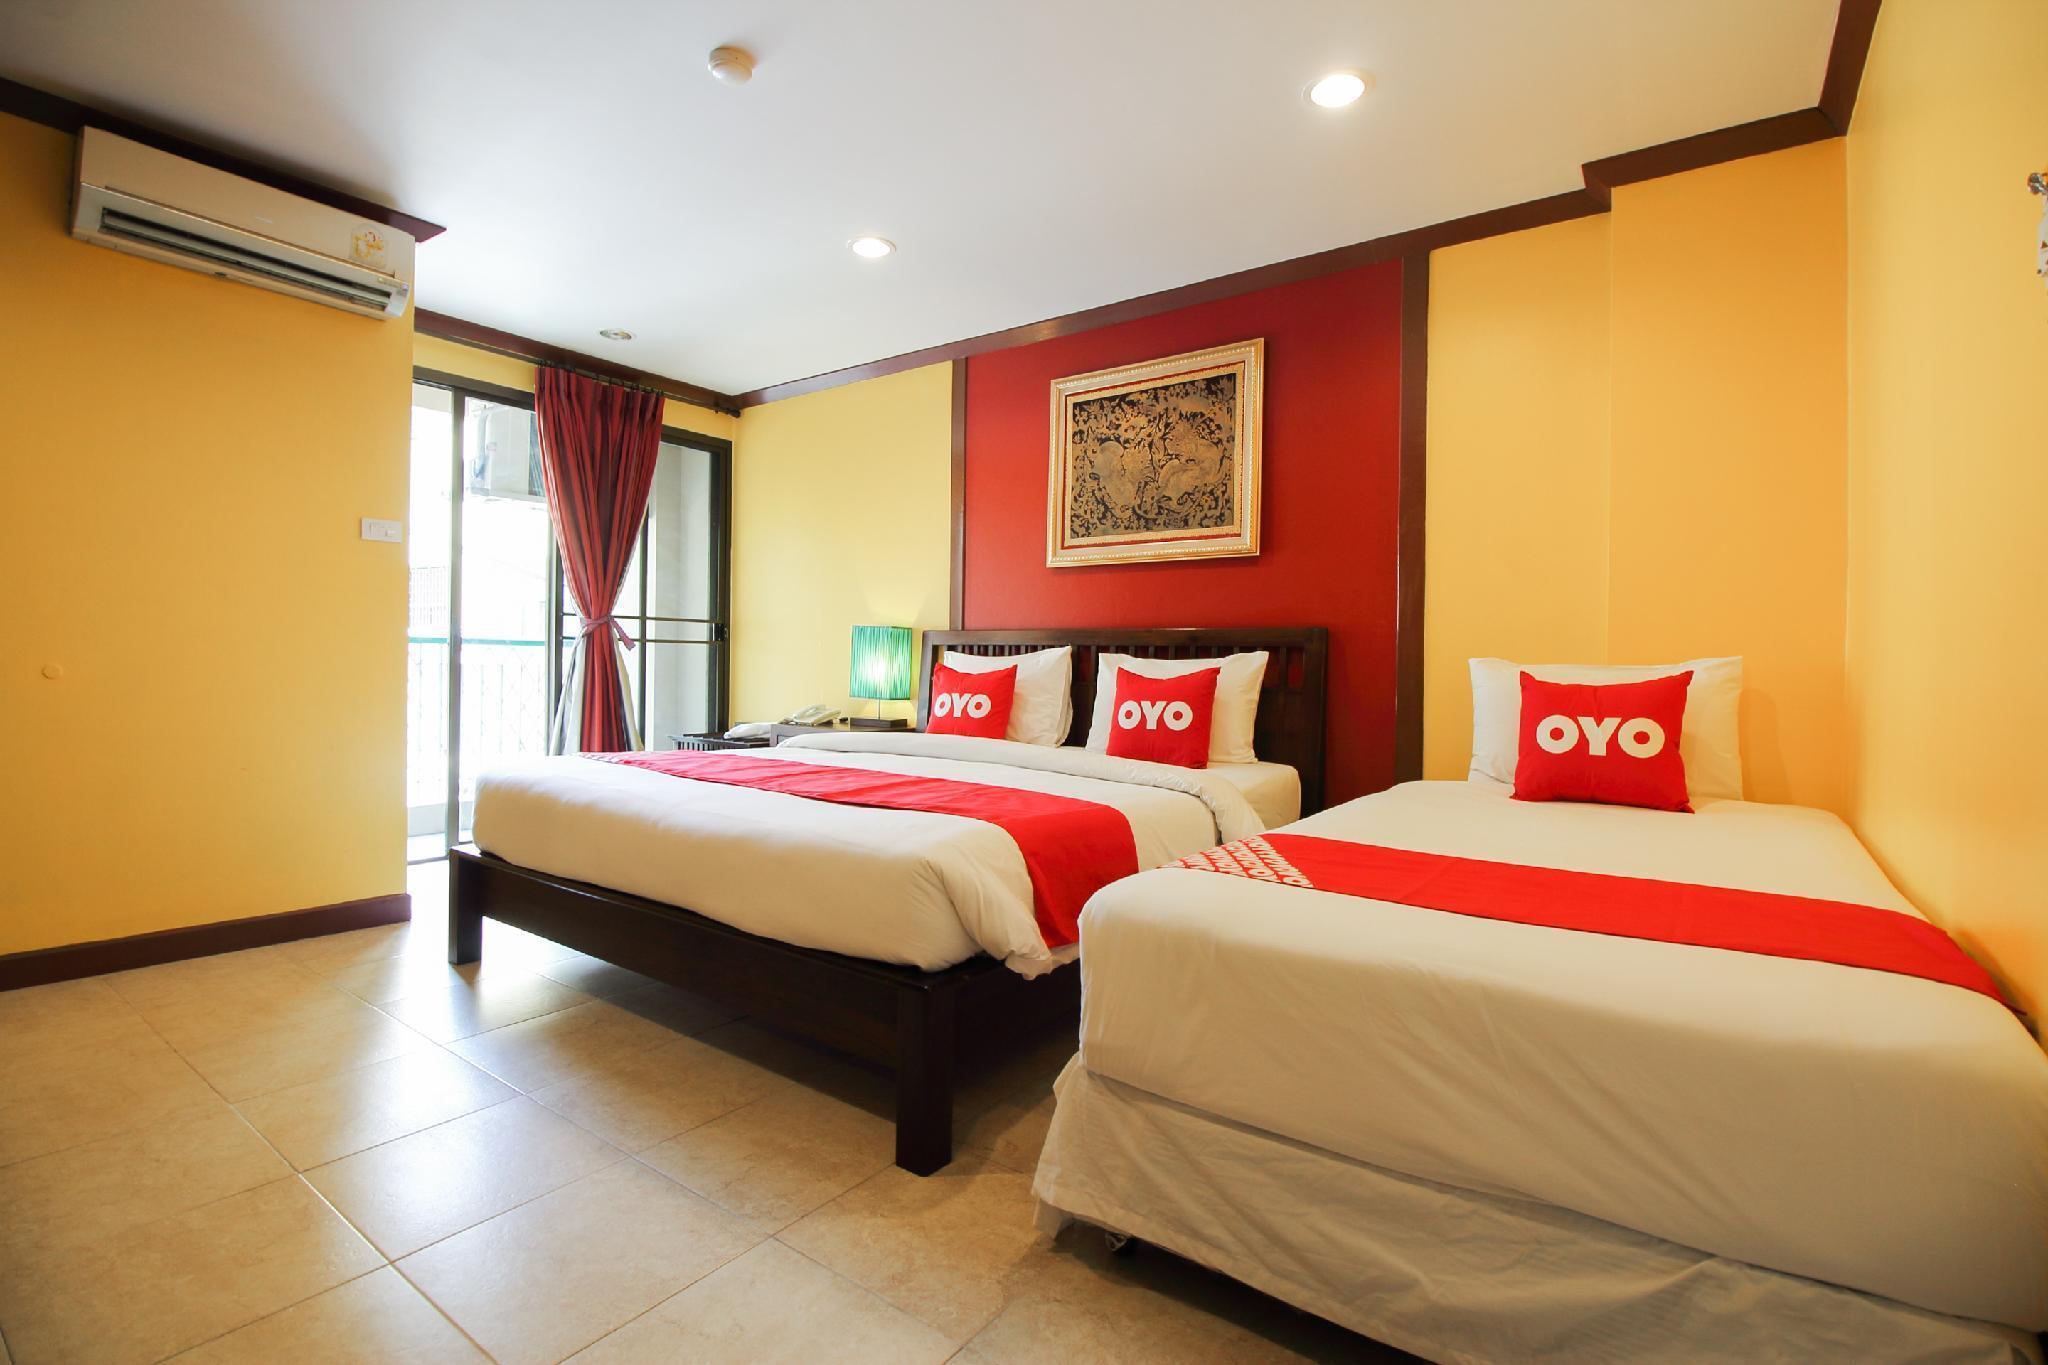 OYO 434 Boonsiri Place Hotel โอโย 434 บุญศิริ เพลซ โฮเต็ล